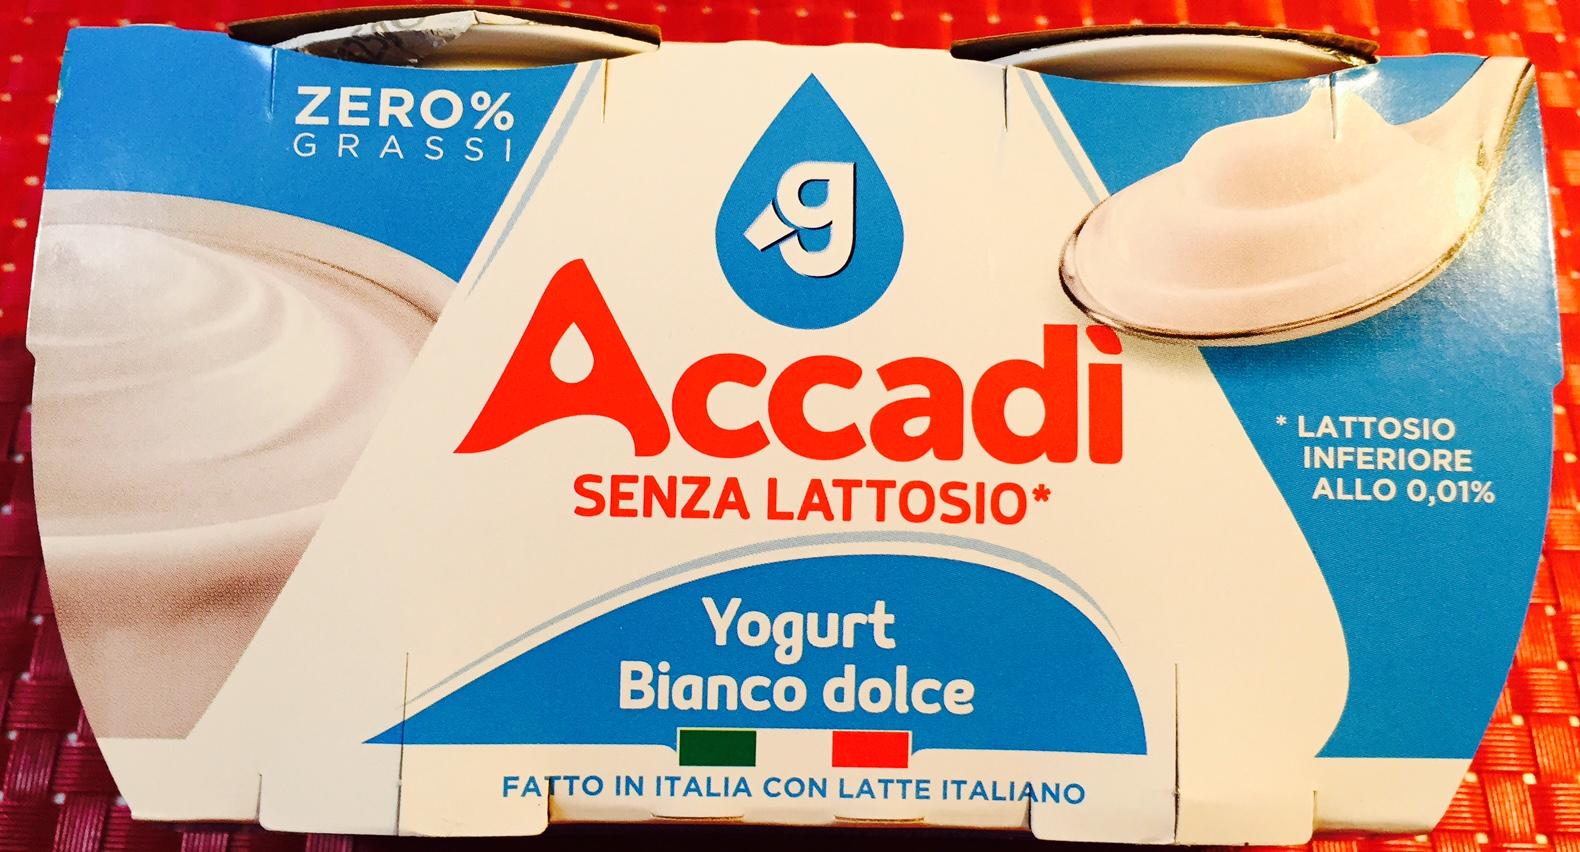 Yogurt Accadì senza lattosio - lattosio <0,01 Image